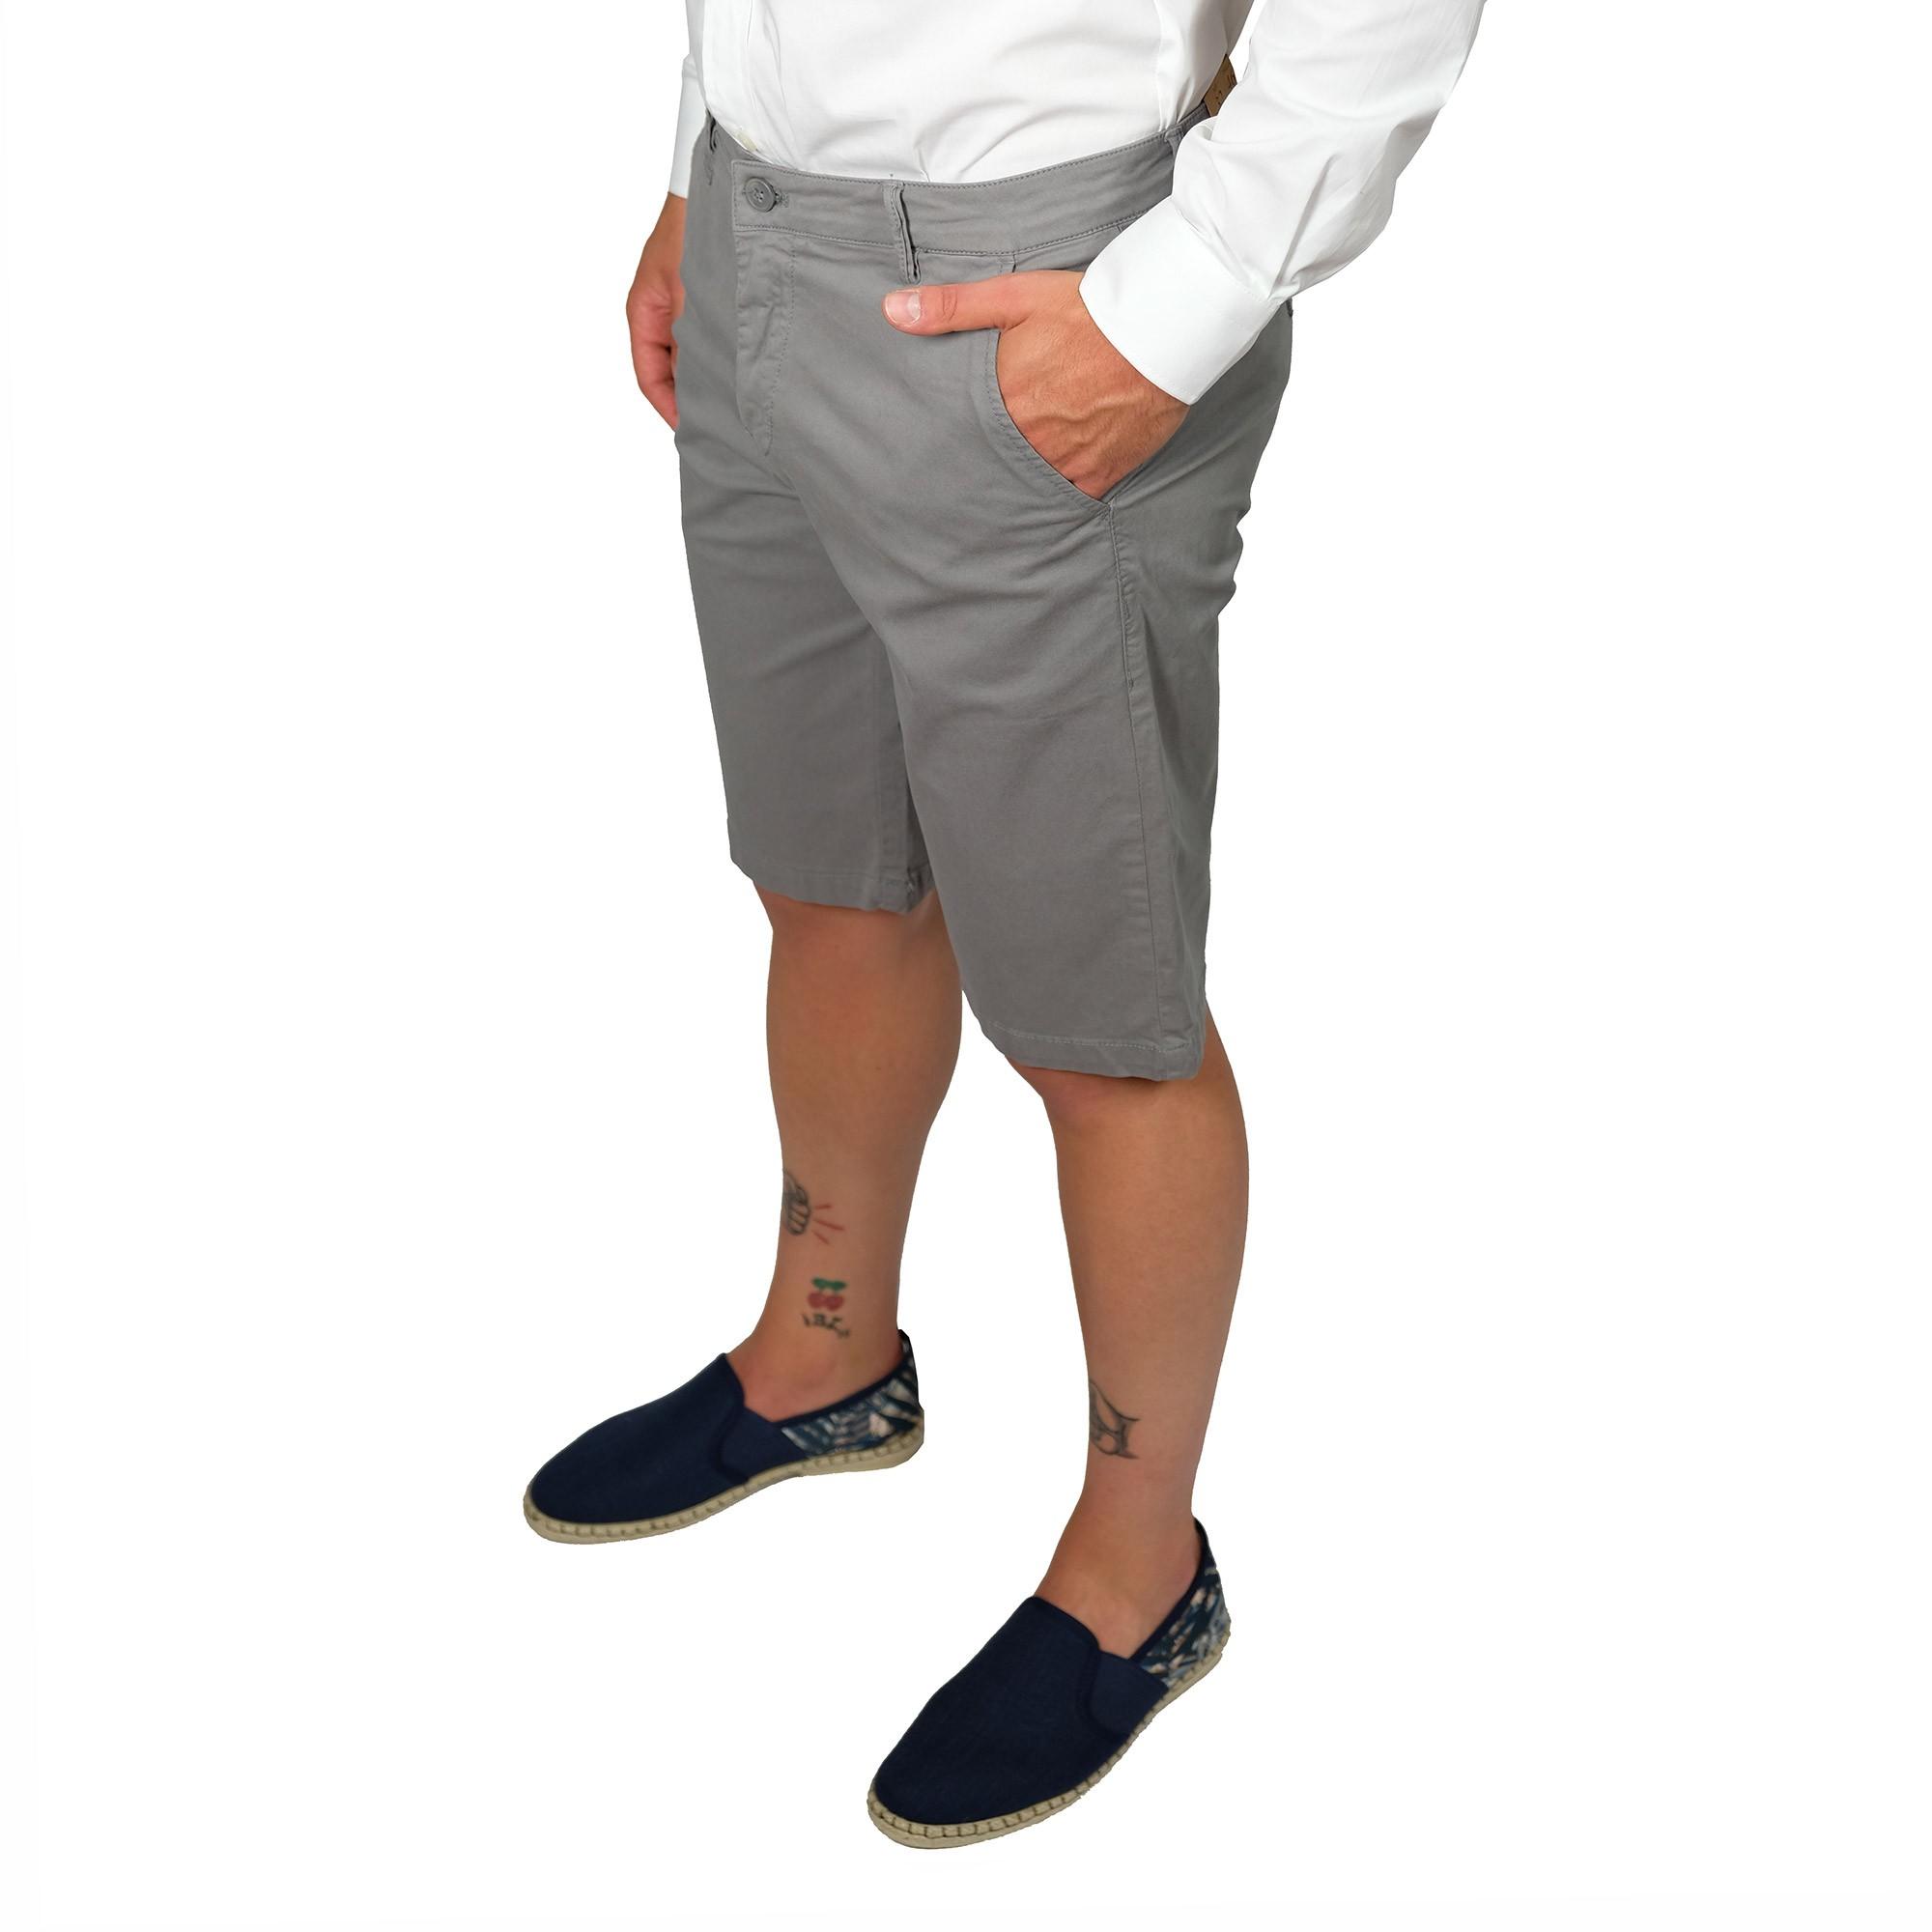 Bermuda-Uomo-Cotone-Jeans-Pantaloncini-Pantaloni-Corti-Tasca-America-Slim-Shorts miniatura 3